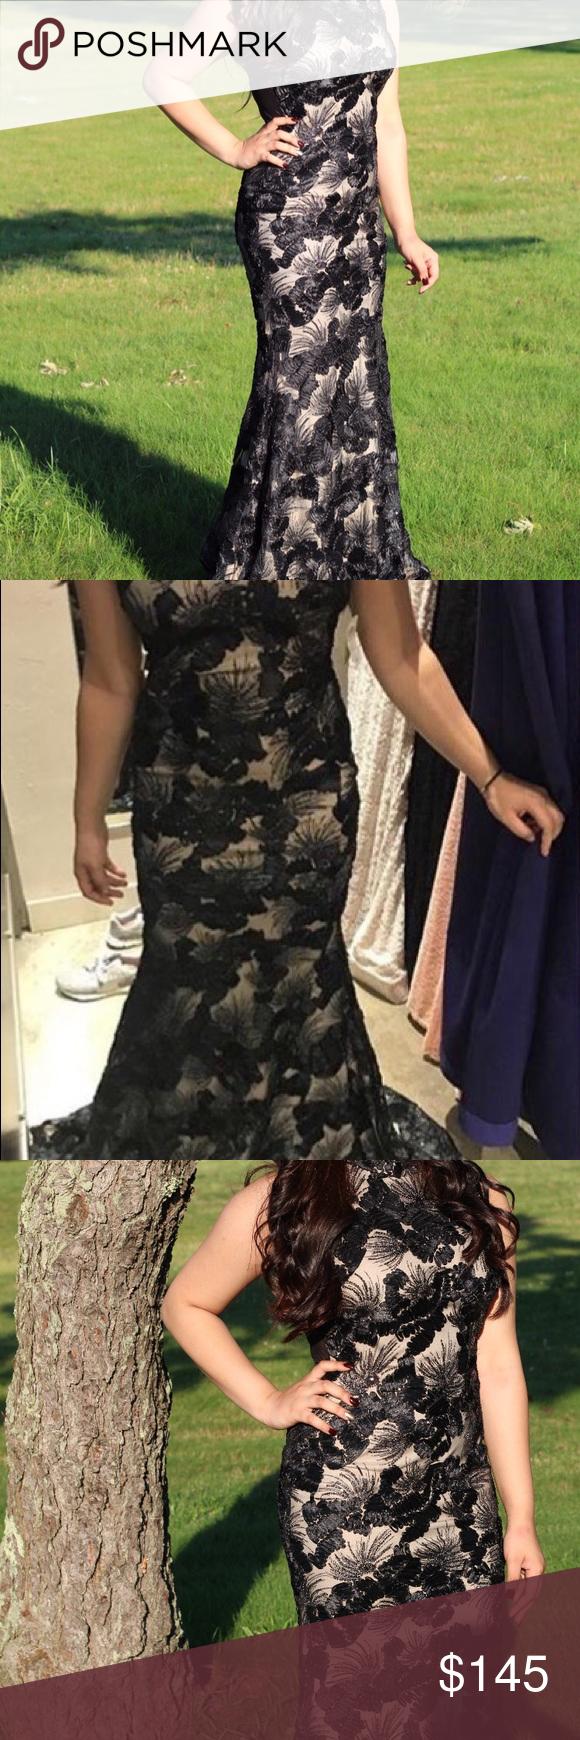 Black lace prom dress lace prom dresses black laces and floral lace